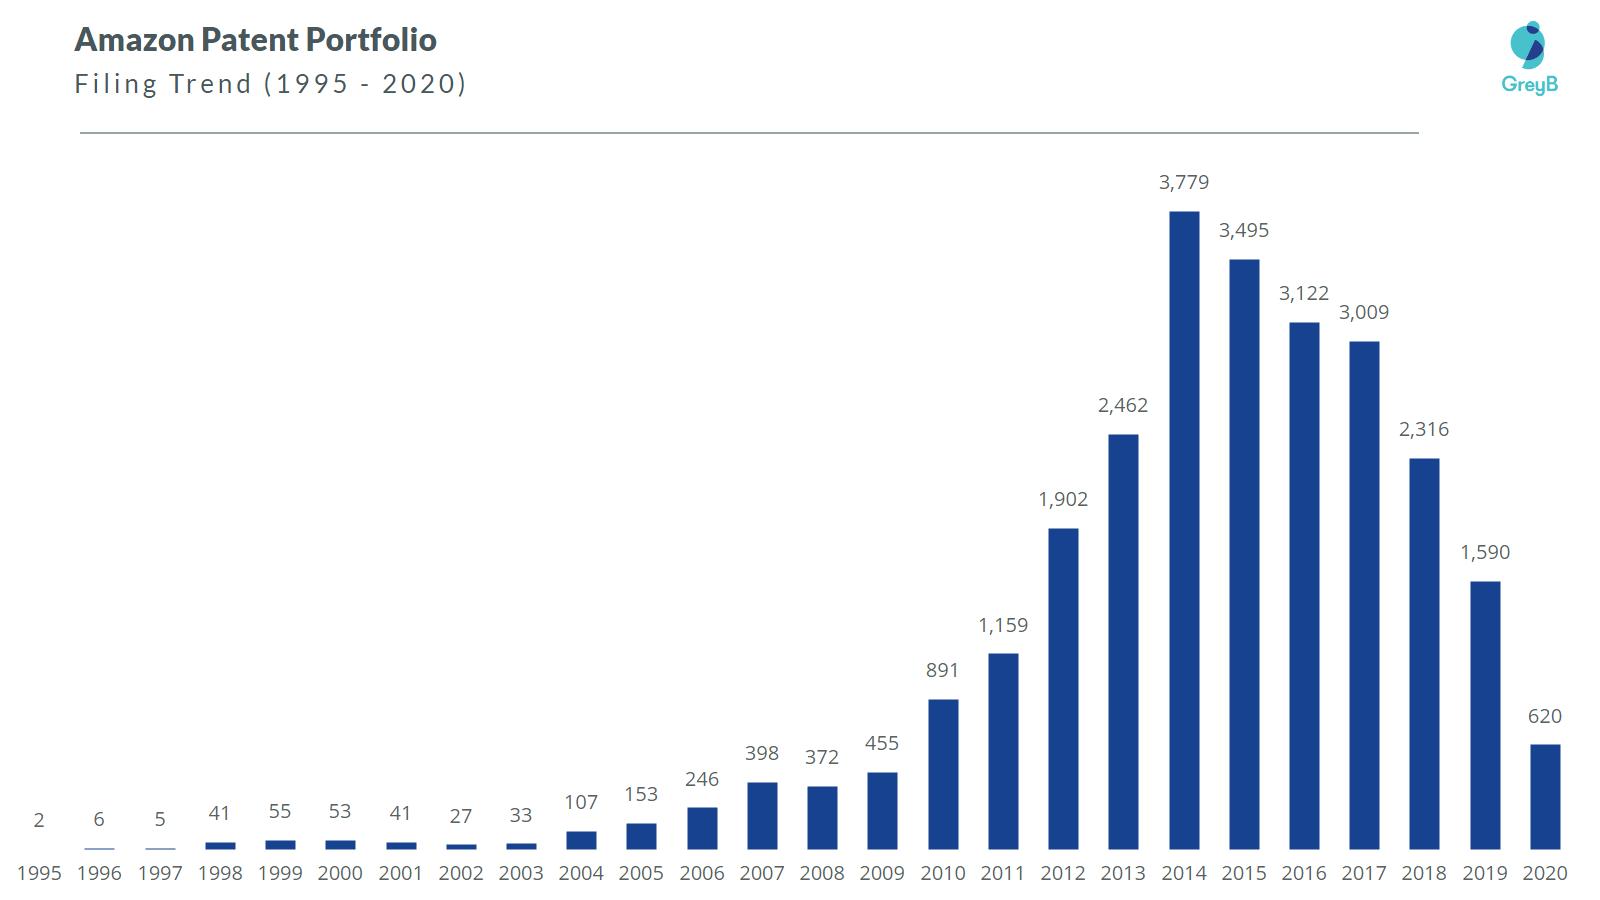 Amazon patent filing trend